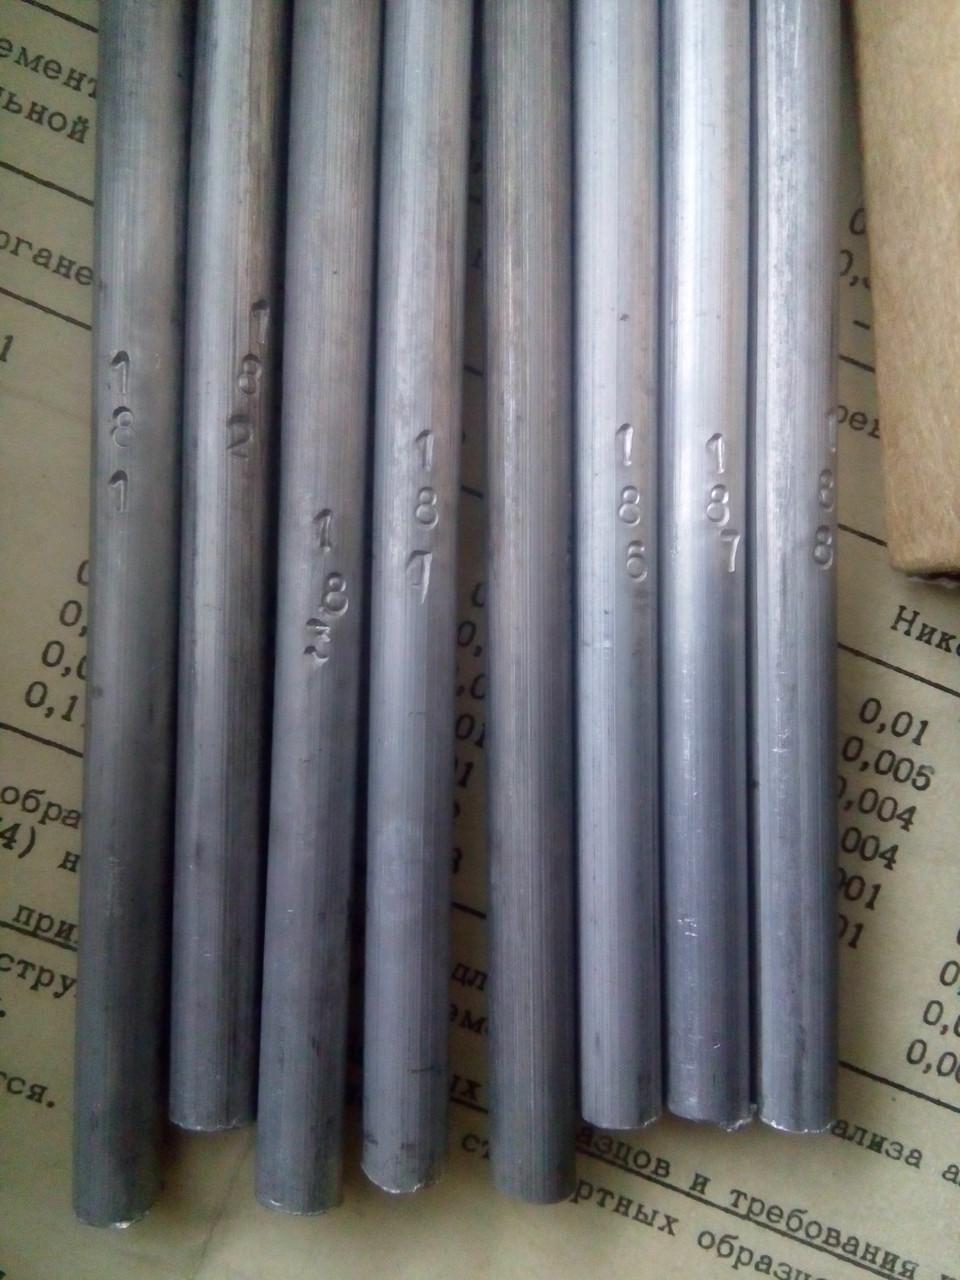 Образцы(алюминий)  типа АМГ Комплект№18